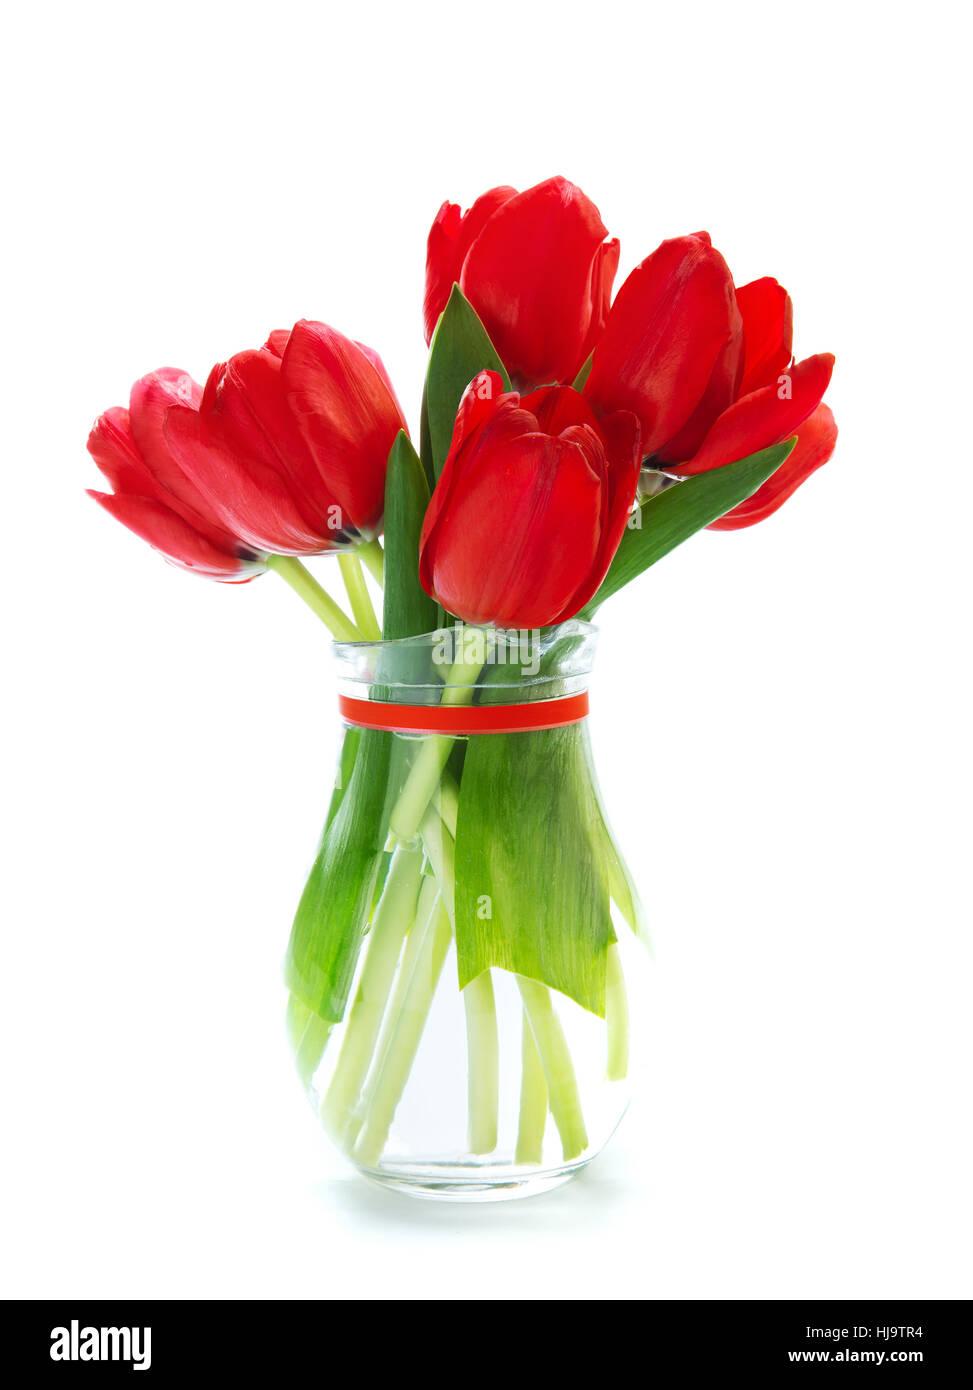 Flower flowers plant tulips spring bouquet mother day stock flower flowers plant tulips spring bouquet mother day birthday red izmirmasajfo